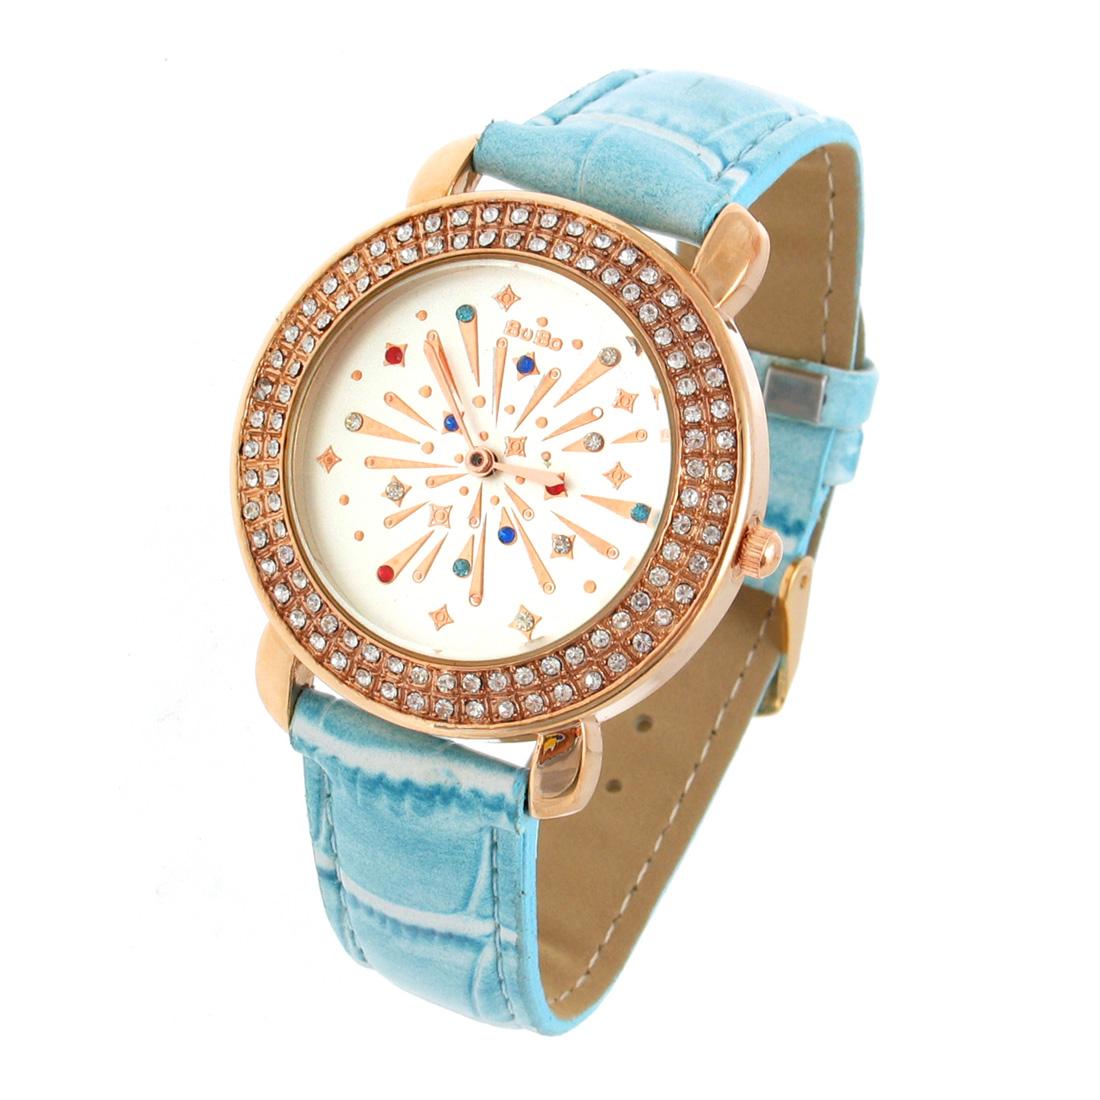 Fashion Jewelry with Crystal Style Plated Quartz Wrist Watch - Blue Wristband